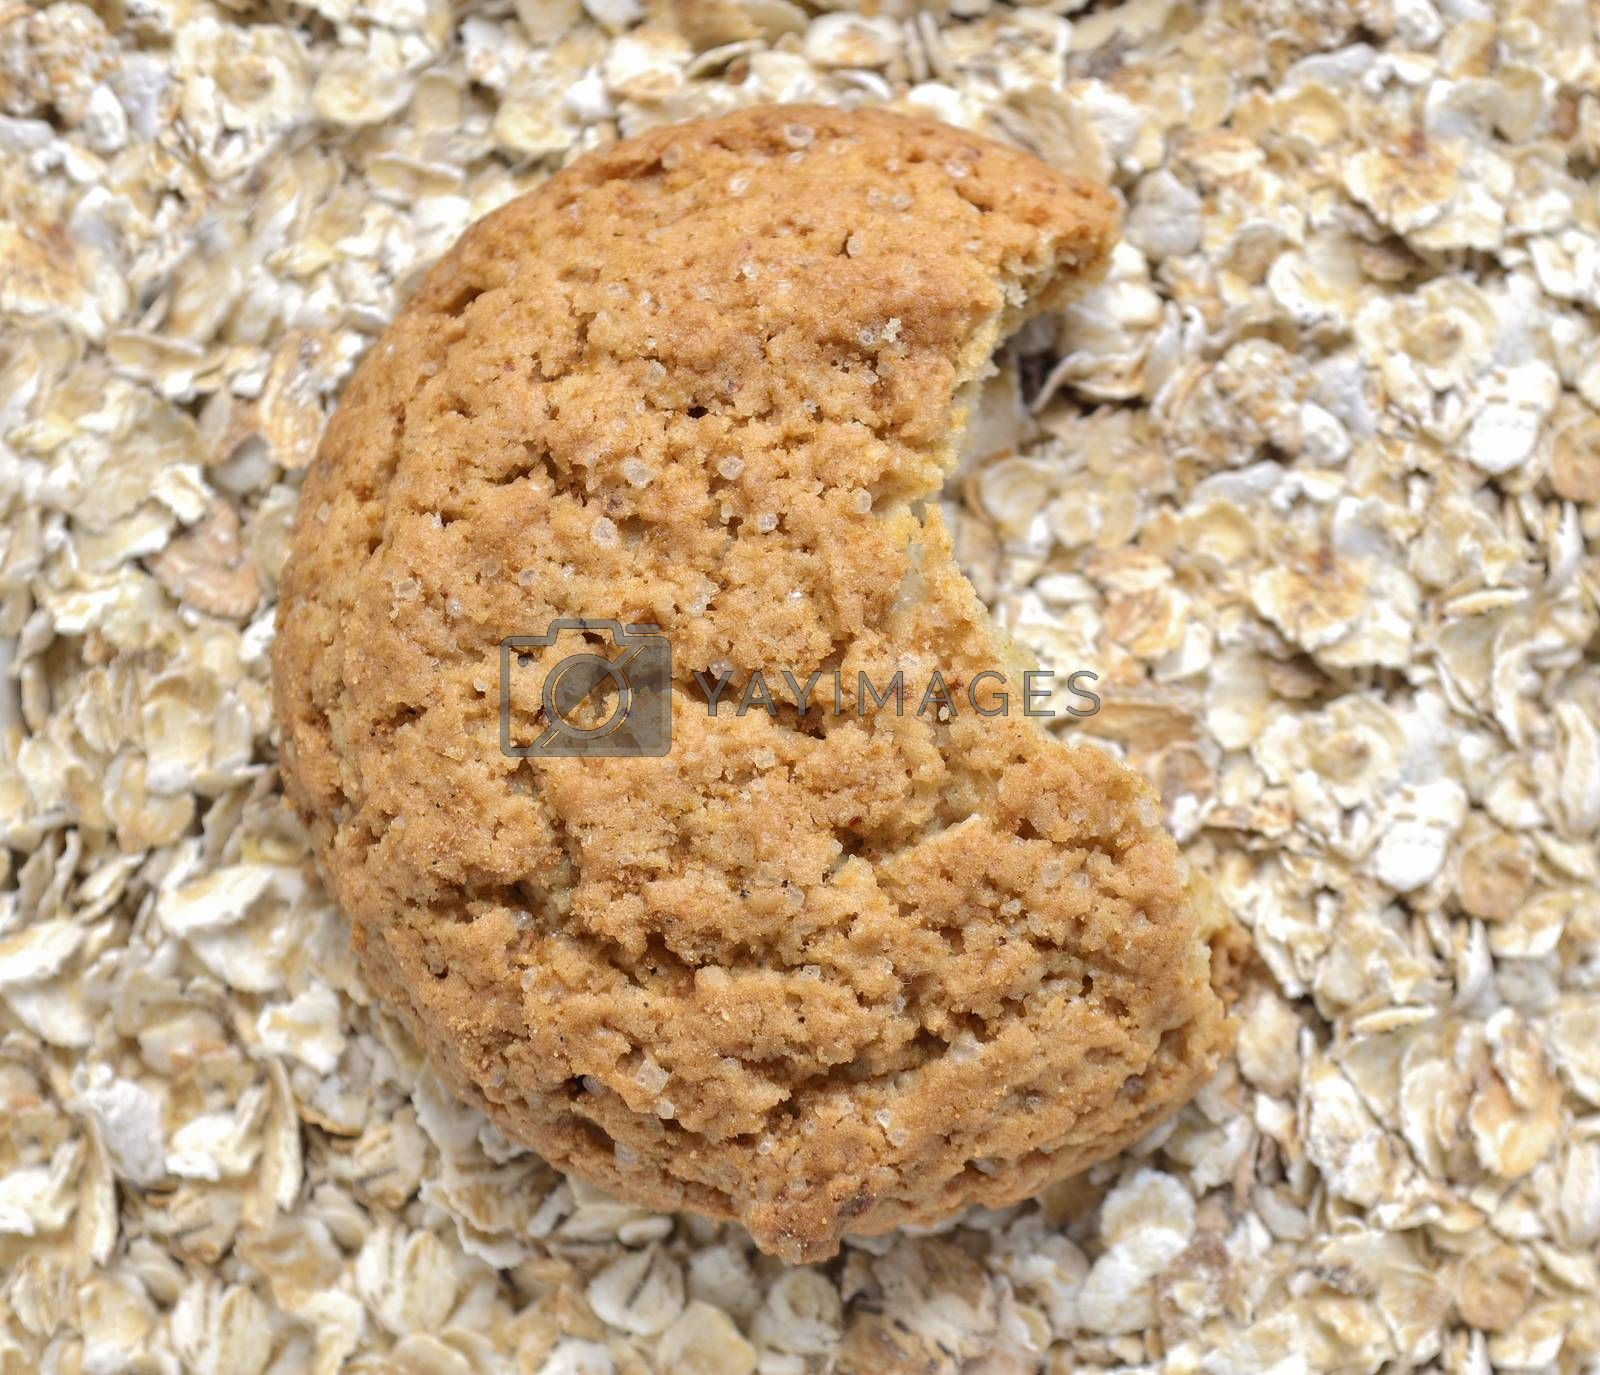 bitten oat cookie over oat flakes background